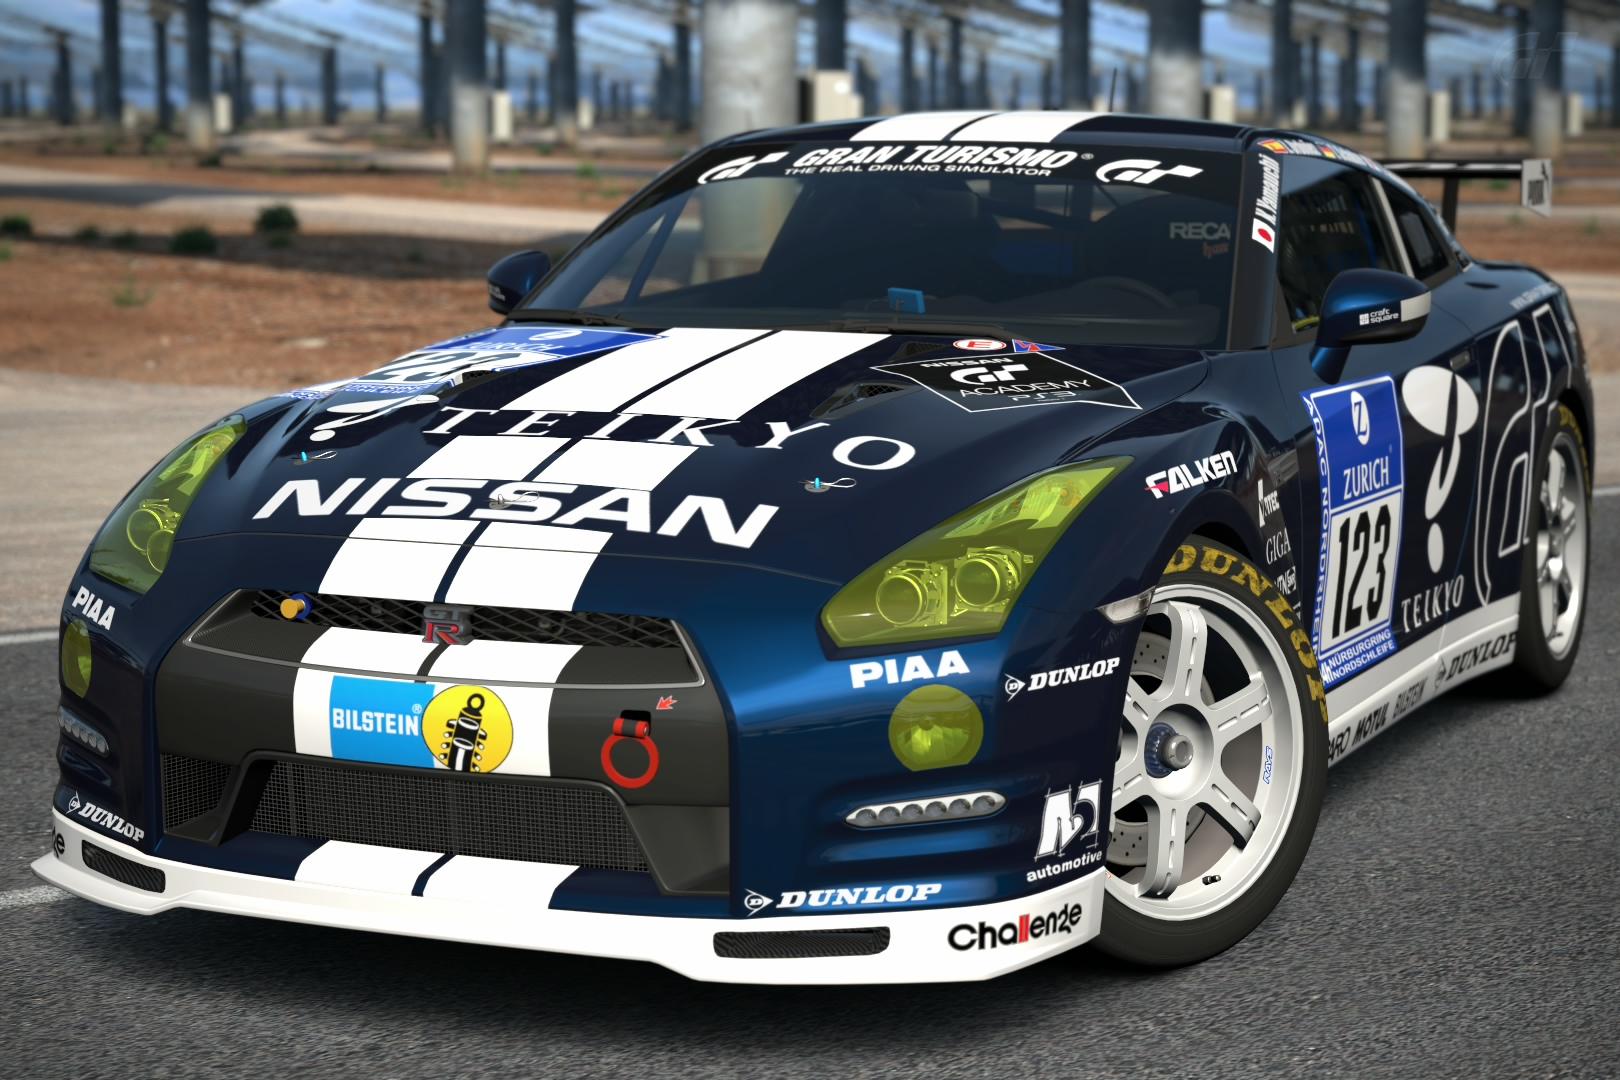 Nissan Gt R N24 Gt Academy 12 Gran Turismo Wiki Fandom Powered